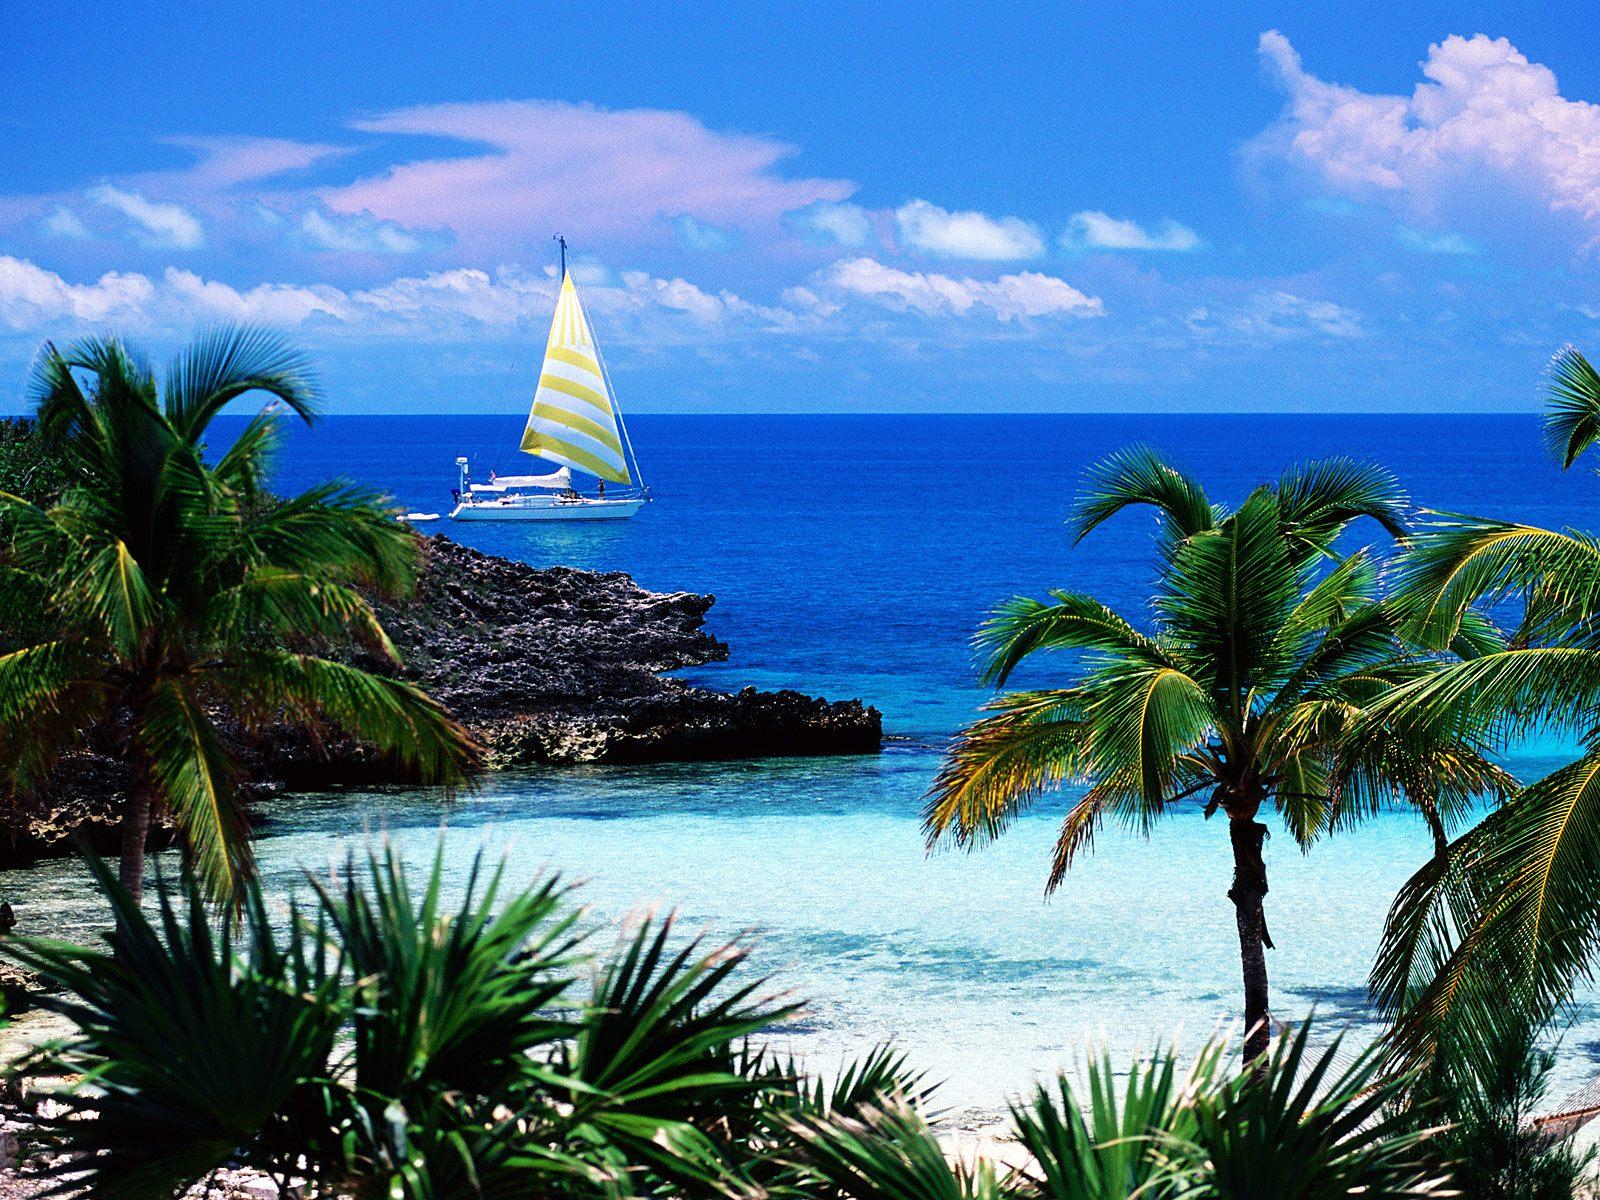 https://1.bp.blogspot.com/-o7FX4BygeQ4/Tv3naIX5UQI/AAAAAAAADZA/wIHz0BdejRQ/s1600/Eleuthera+Point%252C+Harbour+Island%252C+Bahamas.jpg